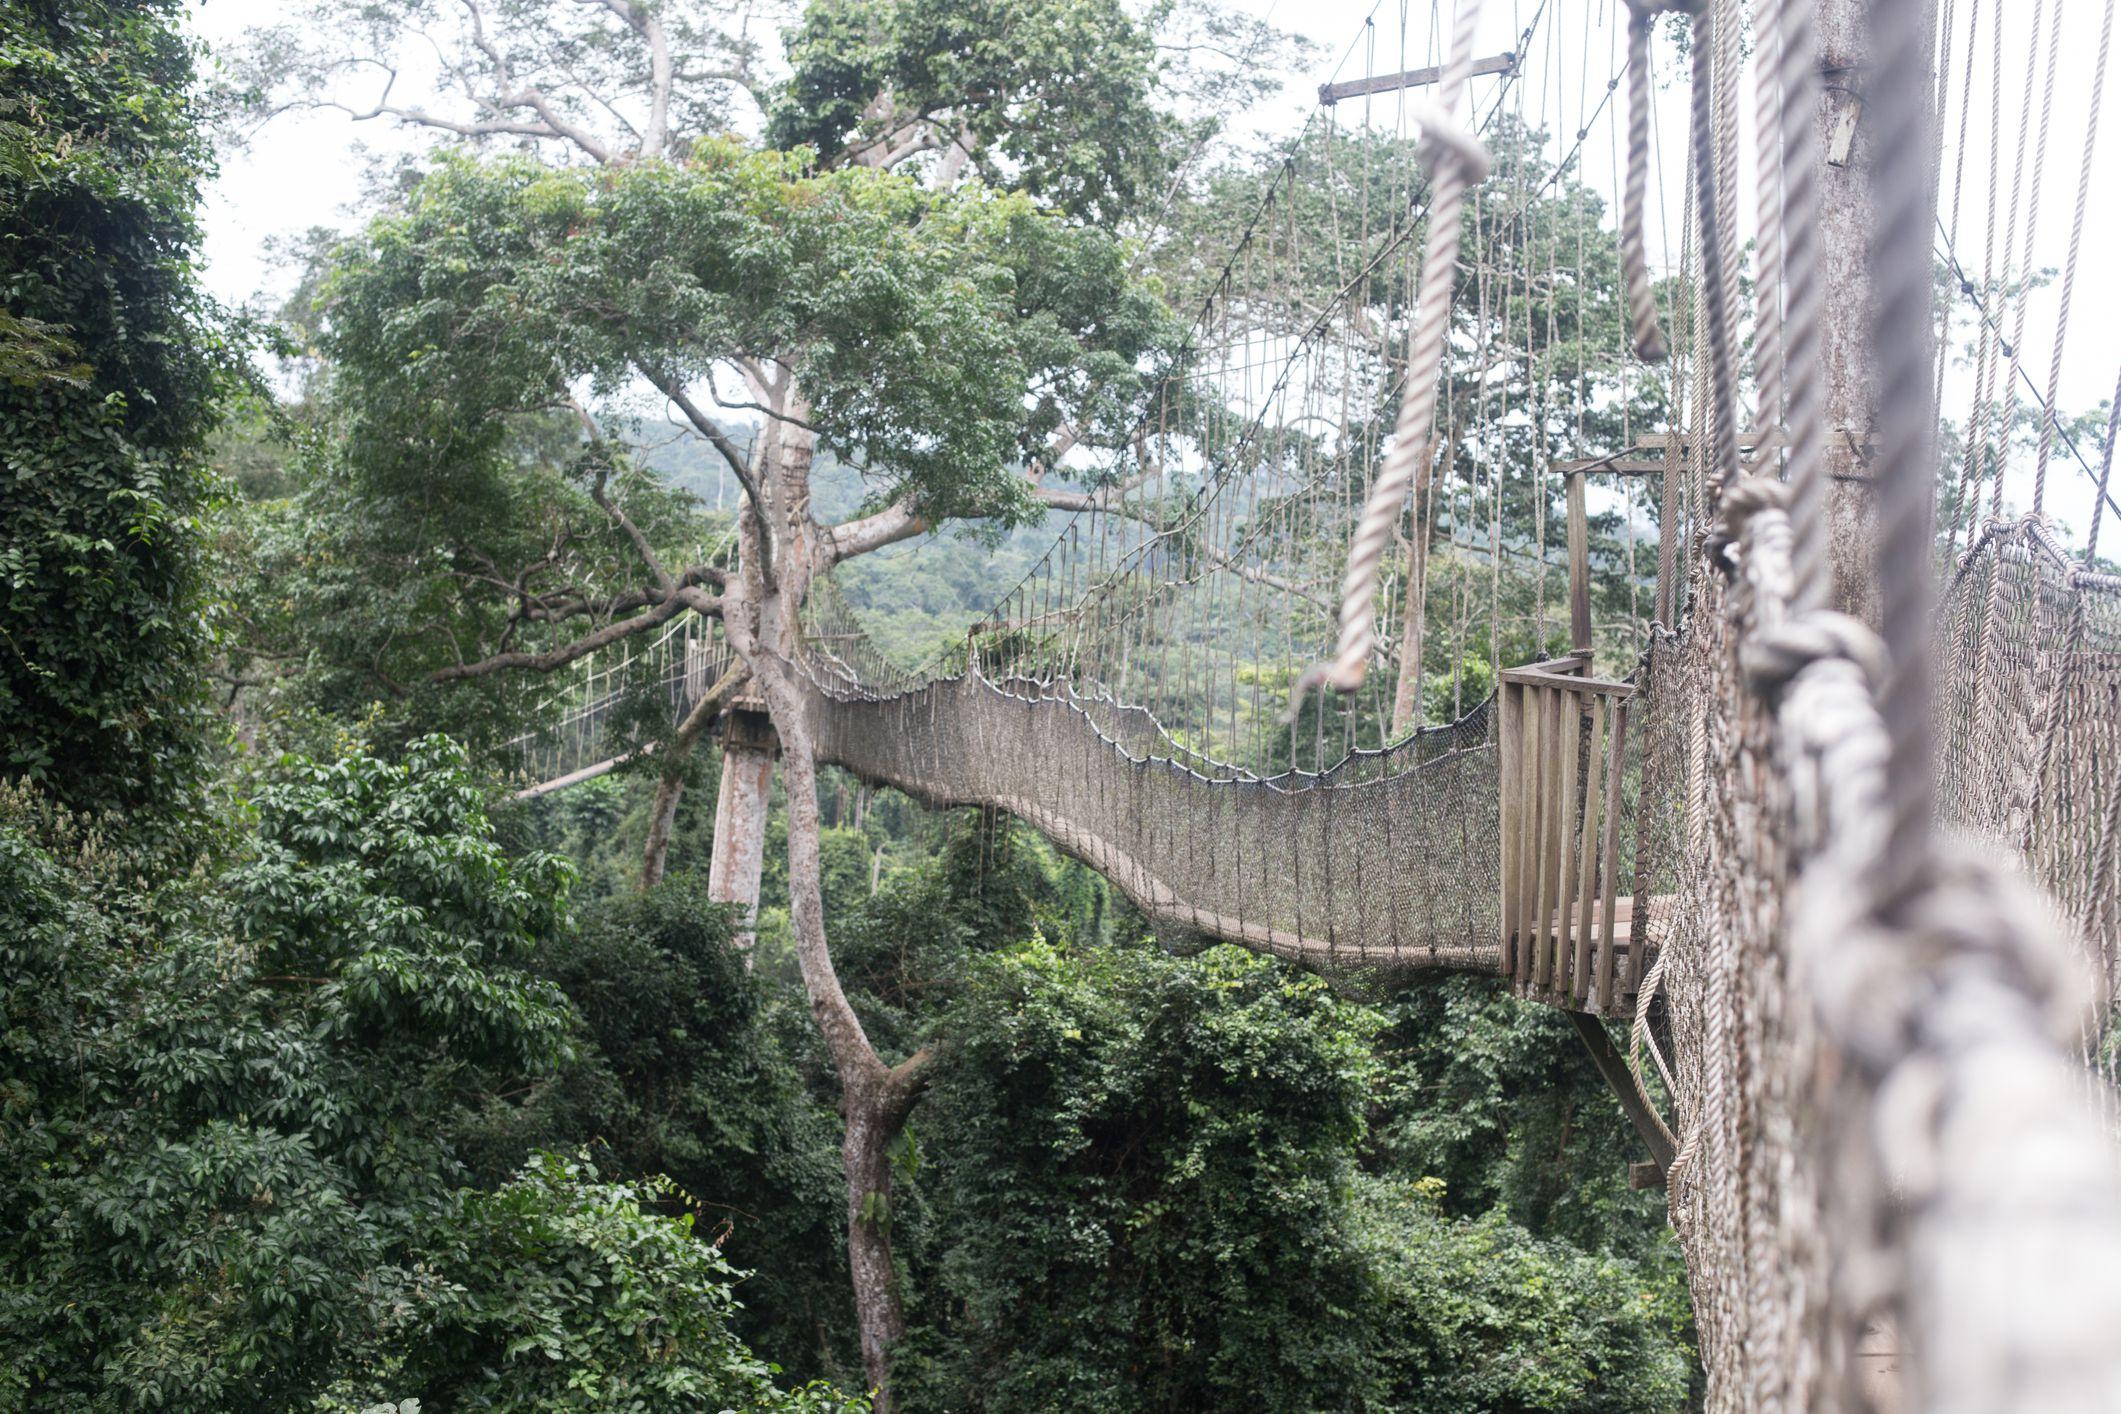 Canopy walk rope bridge in Kakum National Park